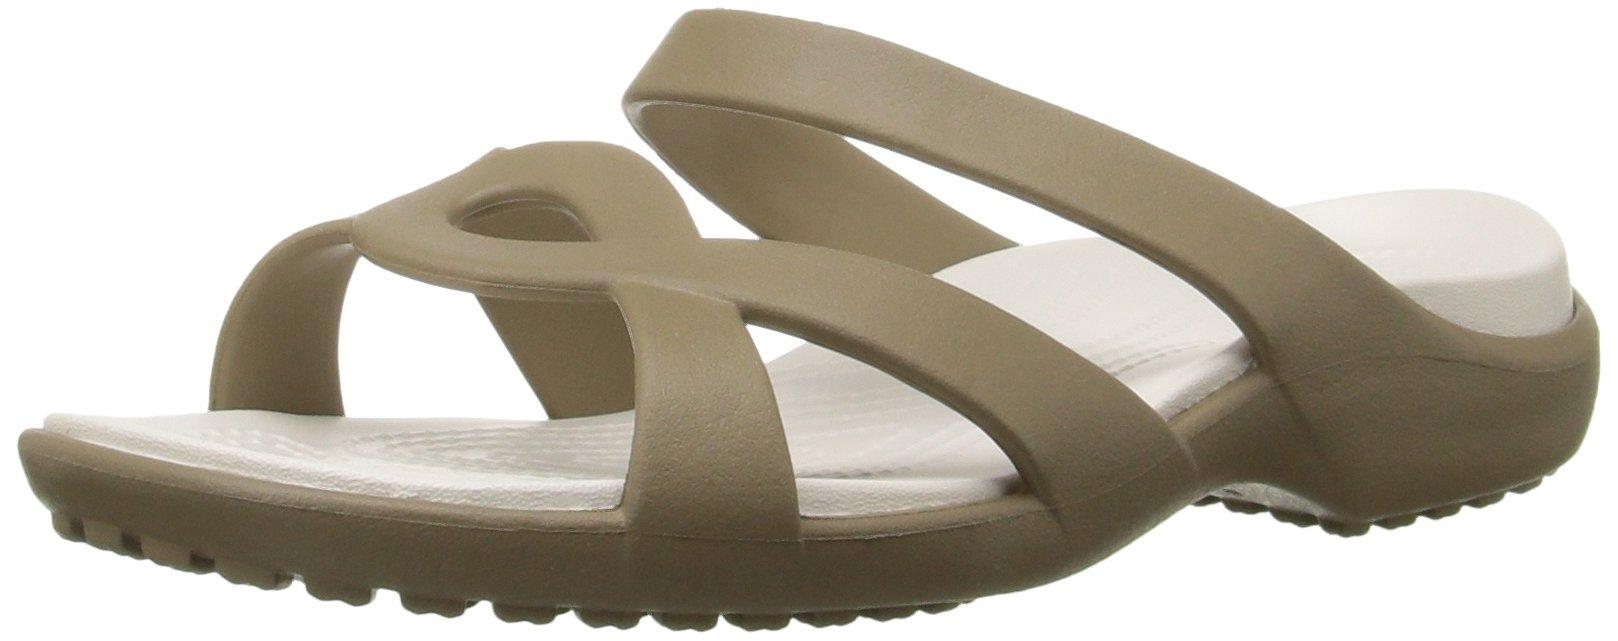 Crocs Women's Meleen Twist Wedge Sandal, Khaki/Oyster, 9 M US